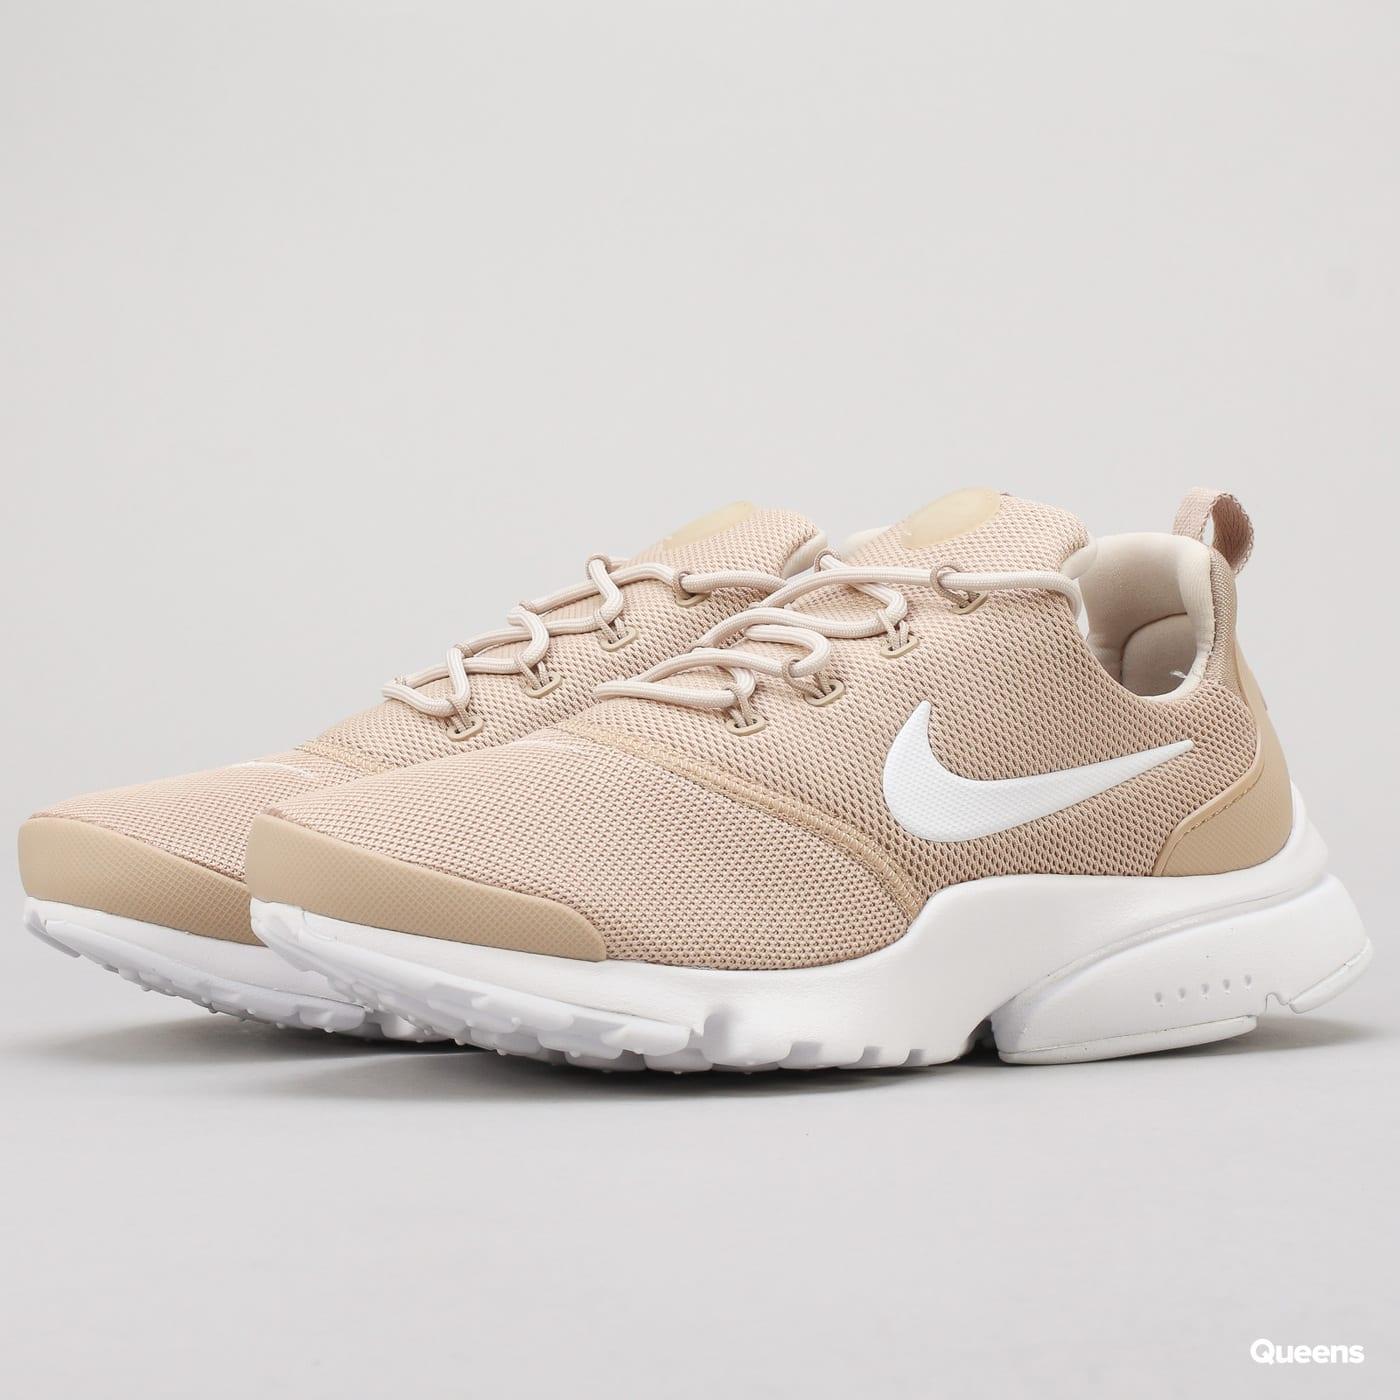 Nike WMNS Nike Presto Fly sand / desert